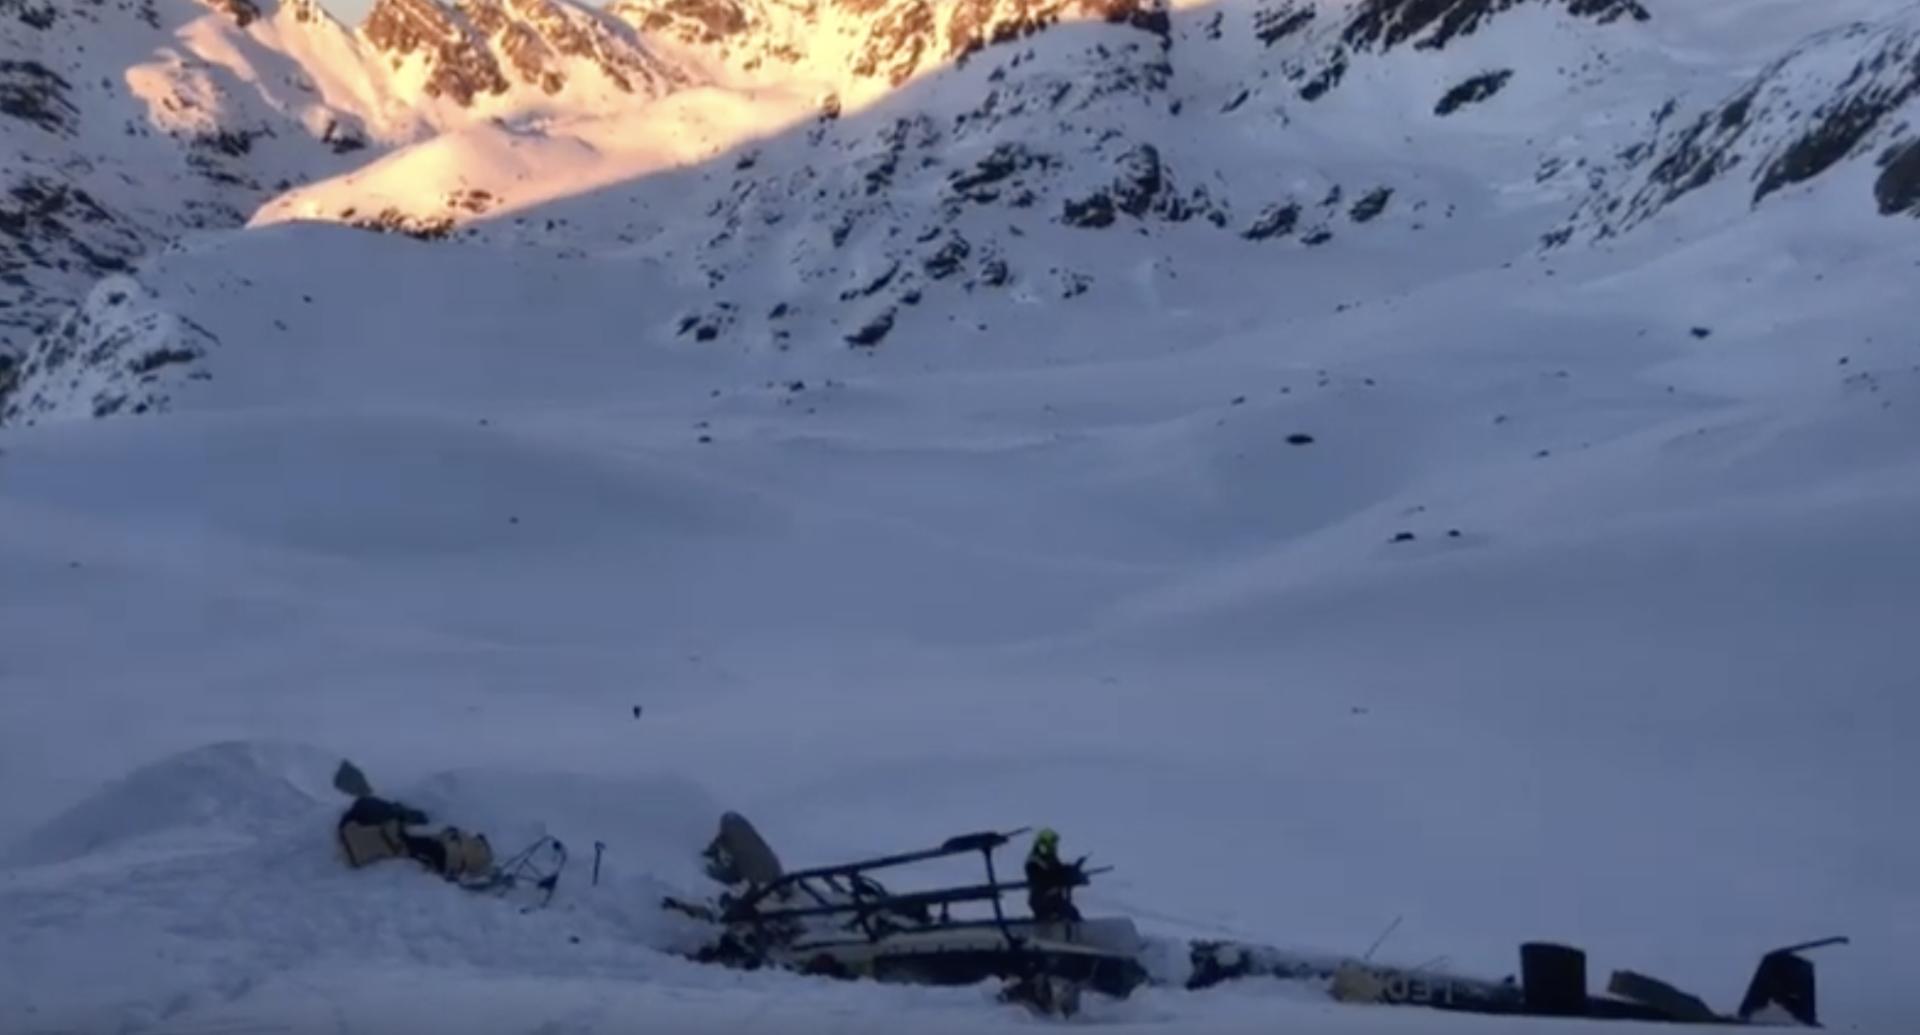 Scontro fra aereo e elicottero a La Thuile